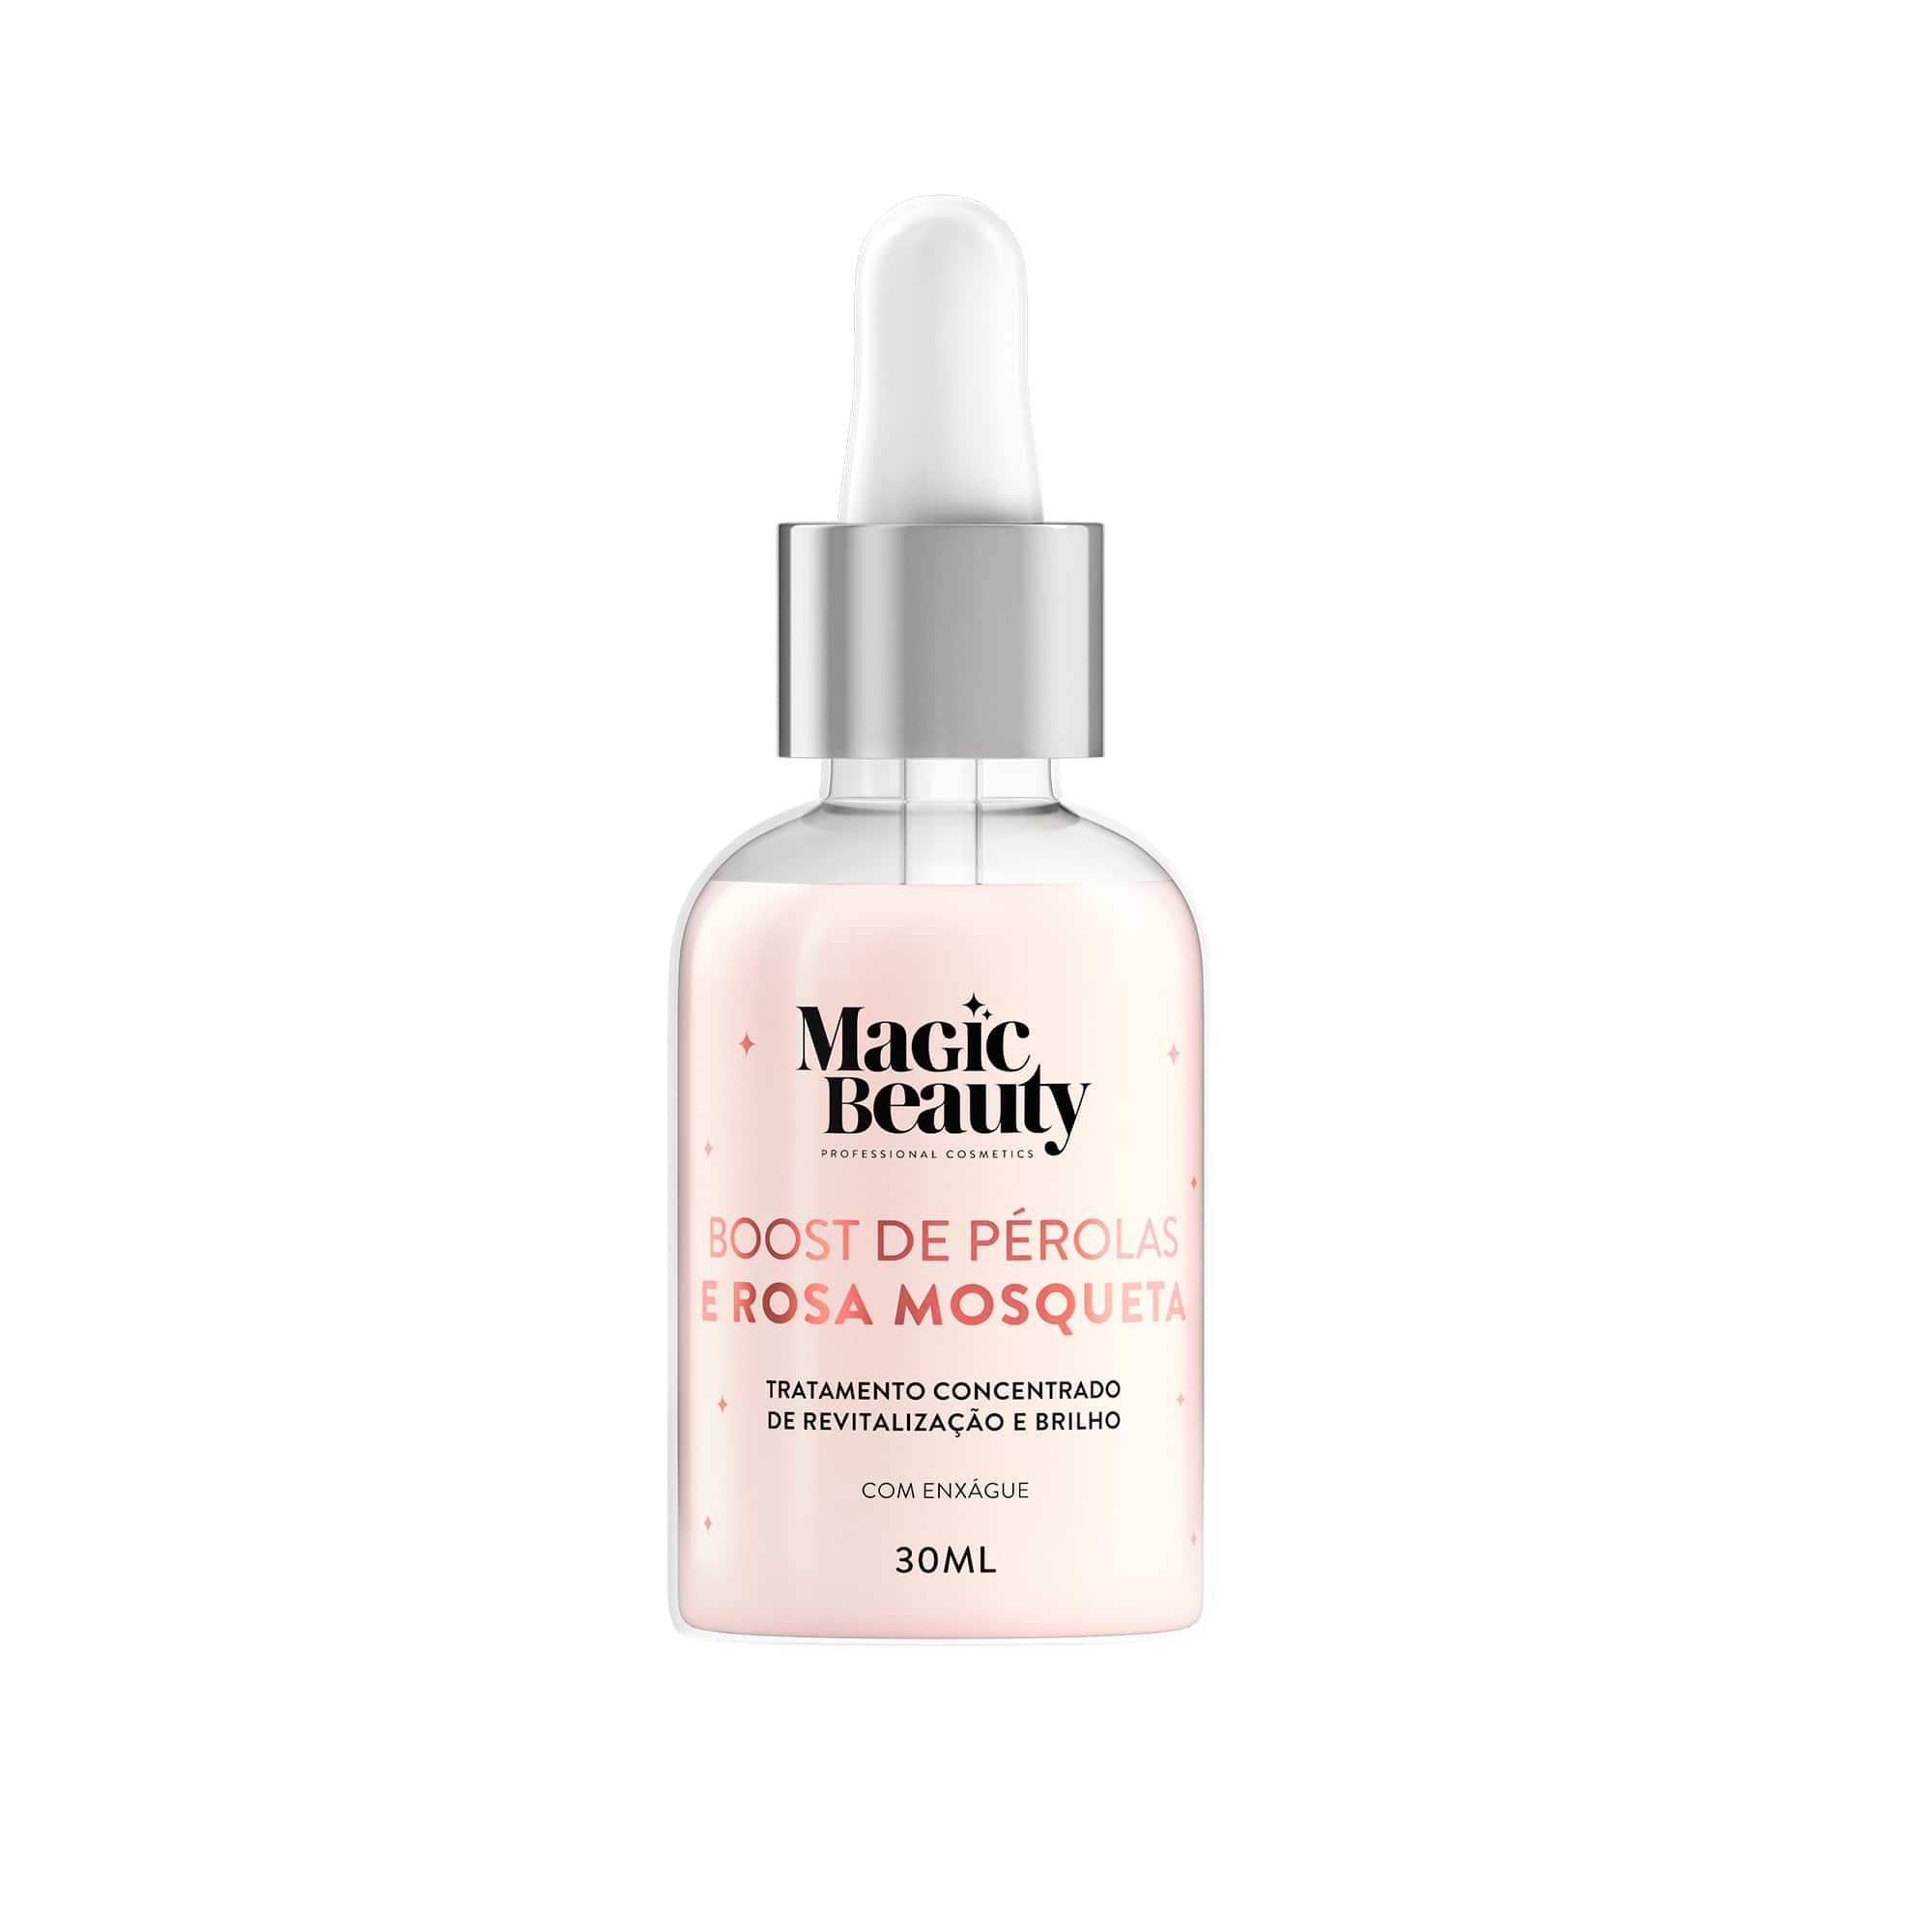 Magic Beauty Crystal Glow Boost de Pérolas e Rosa Mosqueta 30ml